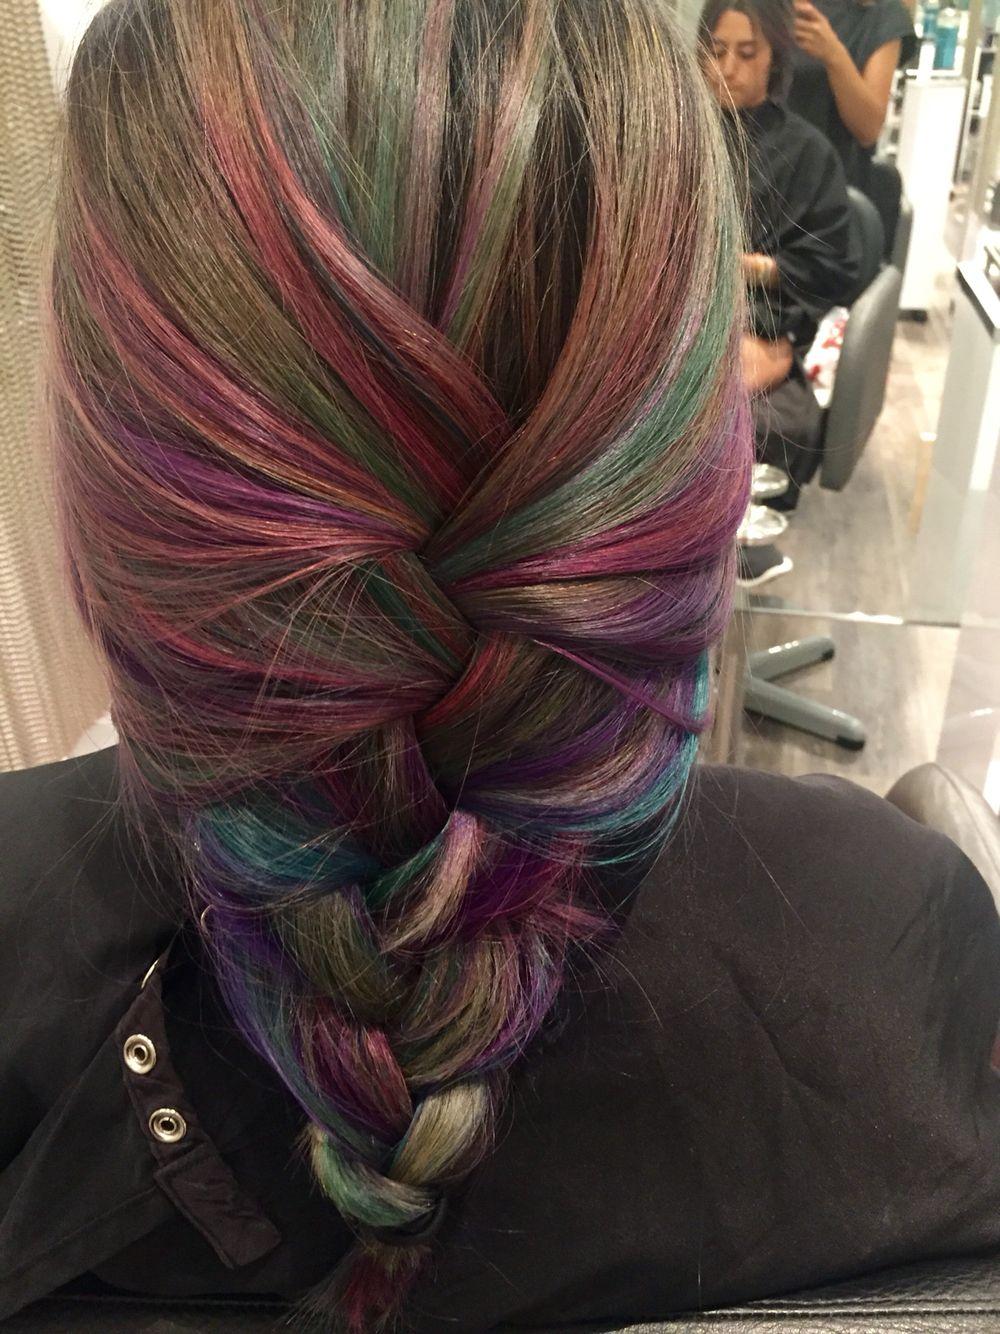 Oil Slick Hair Color Used Pravana Vivids Colors My Color Work At